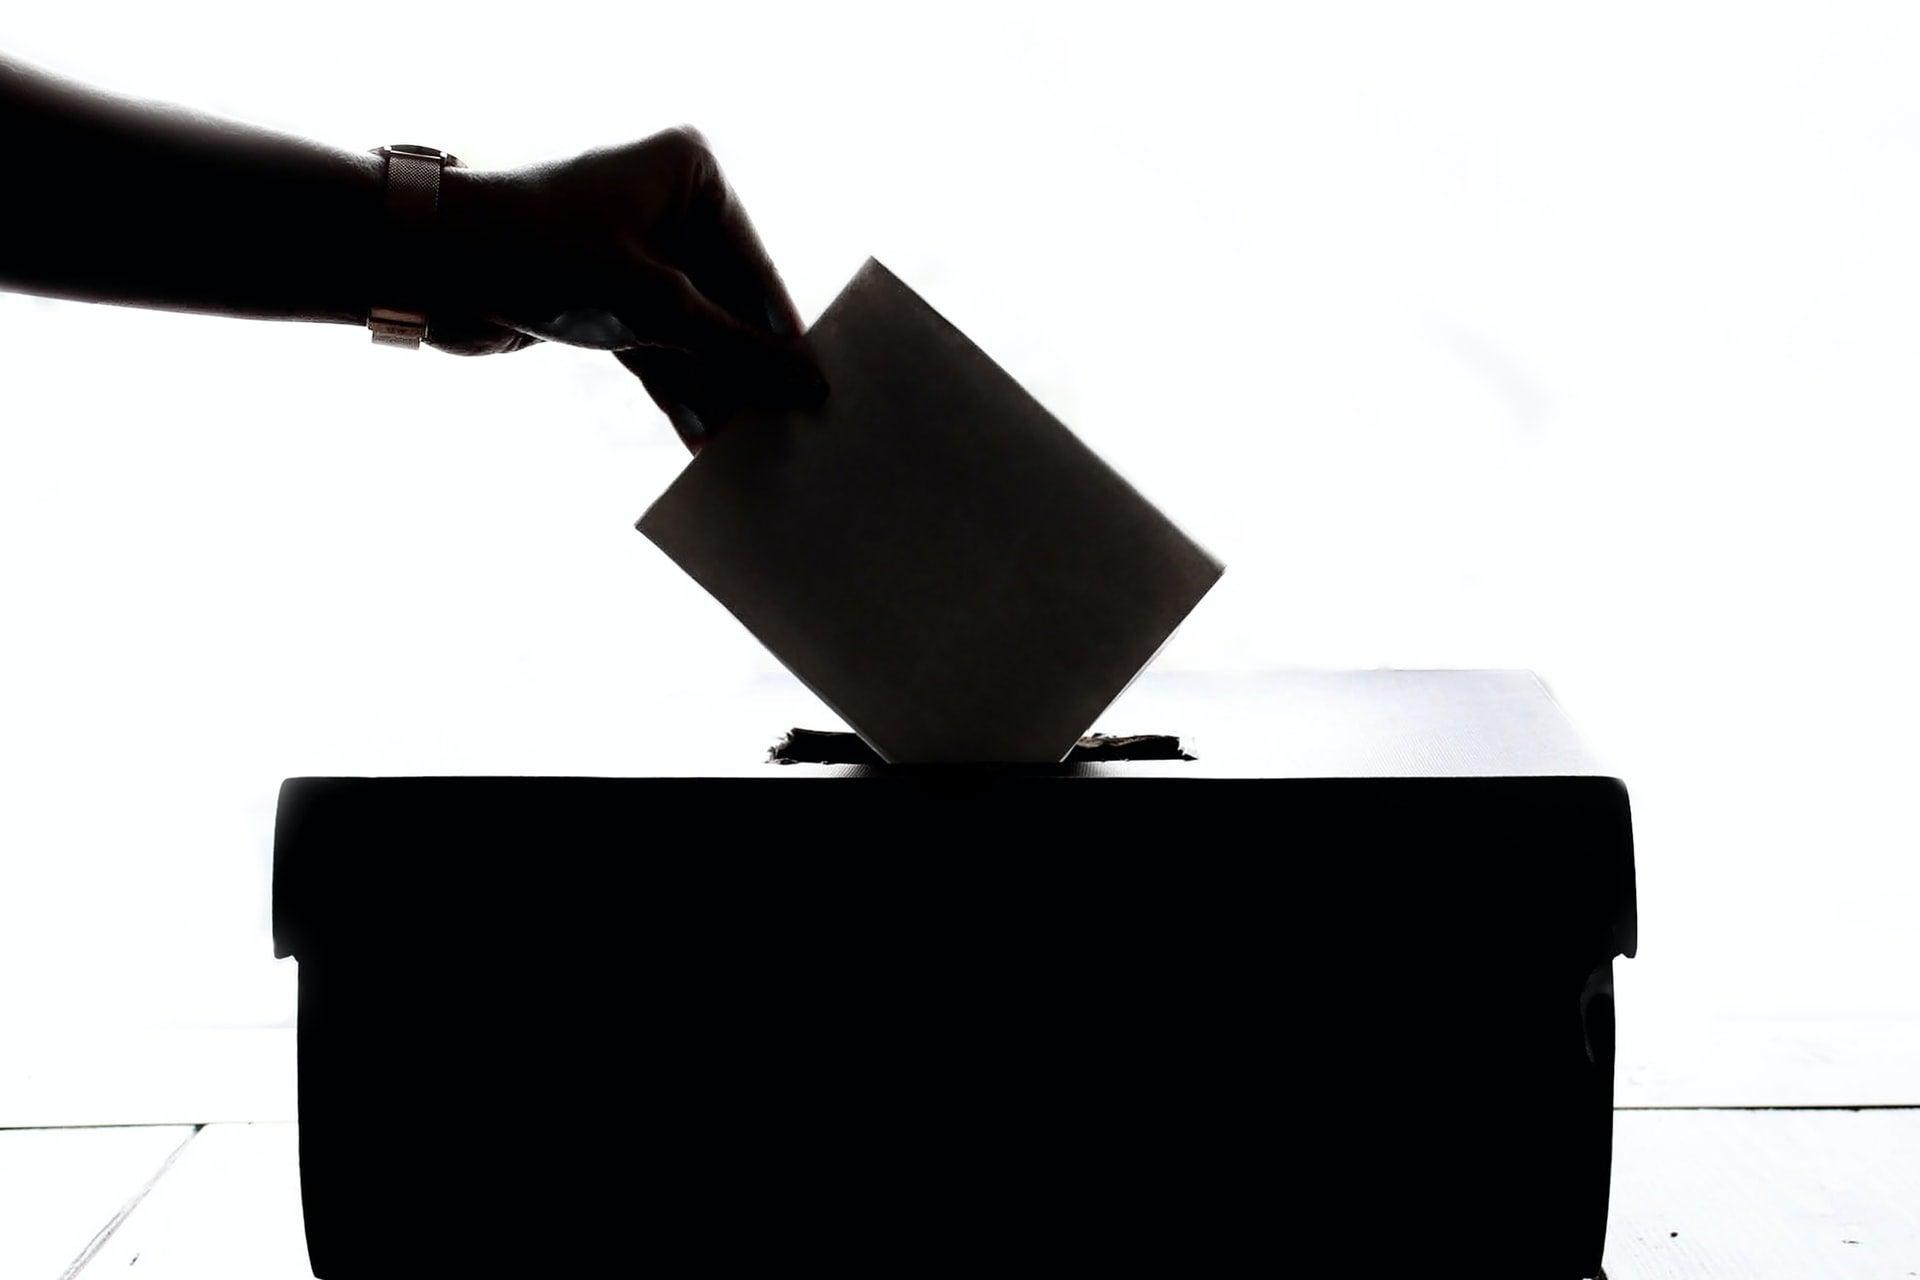 a hand putting a ballot into a box